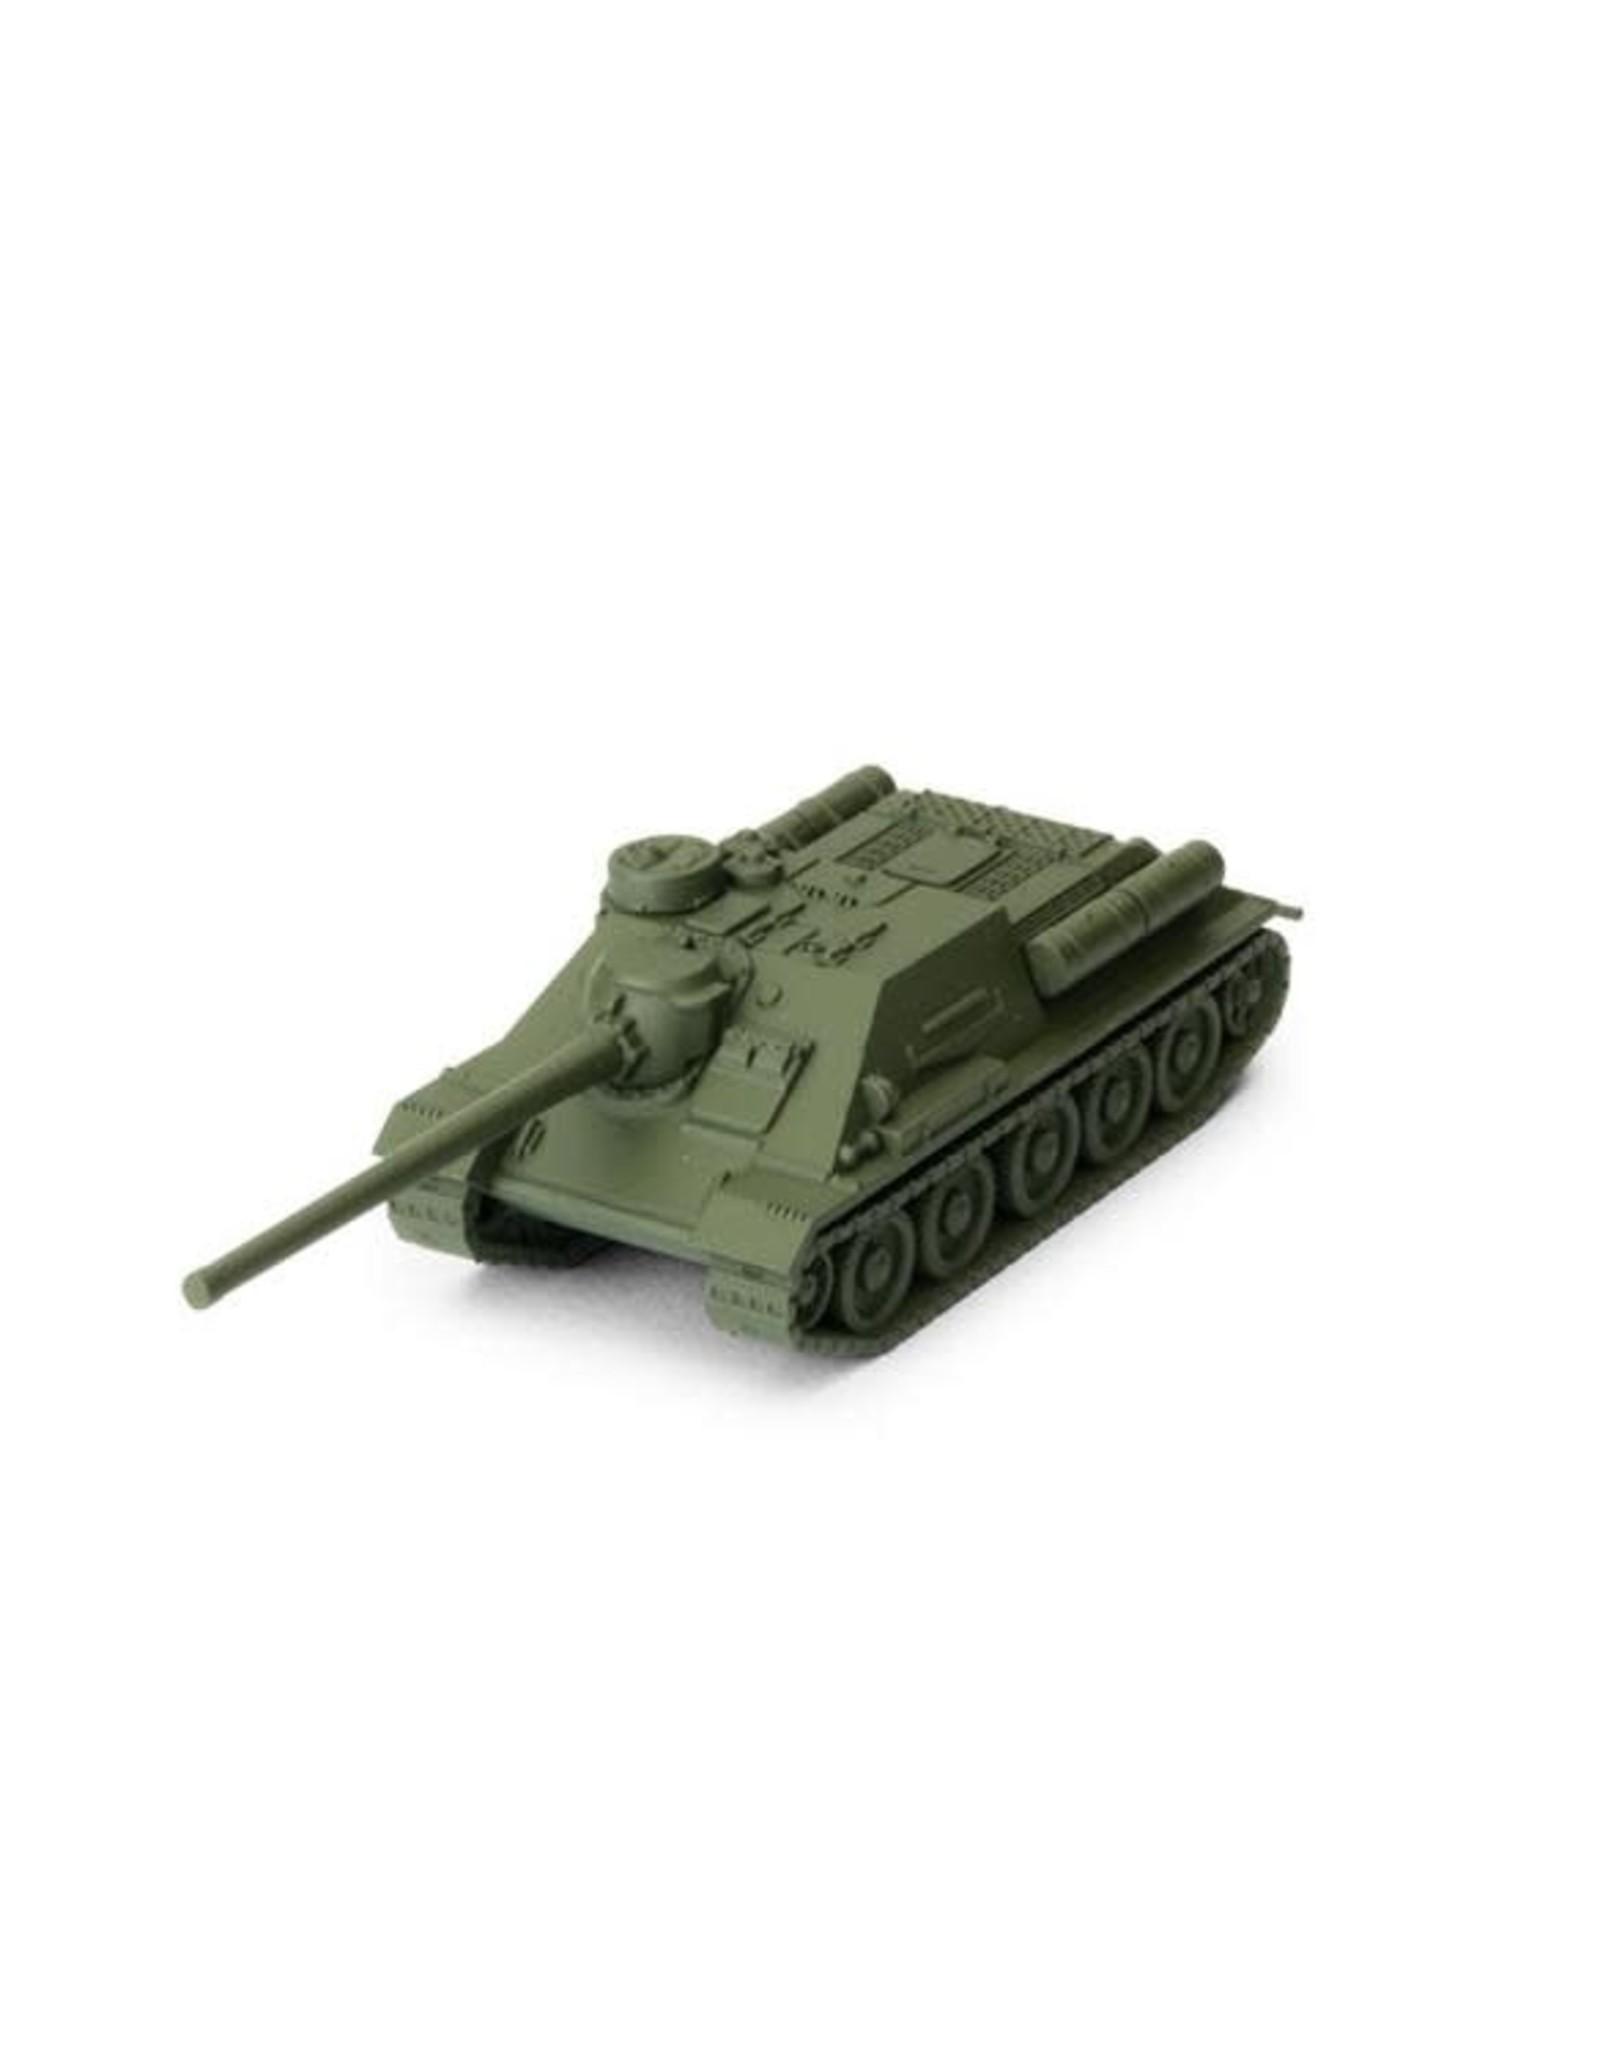 GaleForce nine World of Tanks Expansion - Soviet (SU-100)